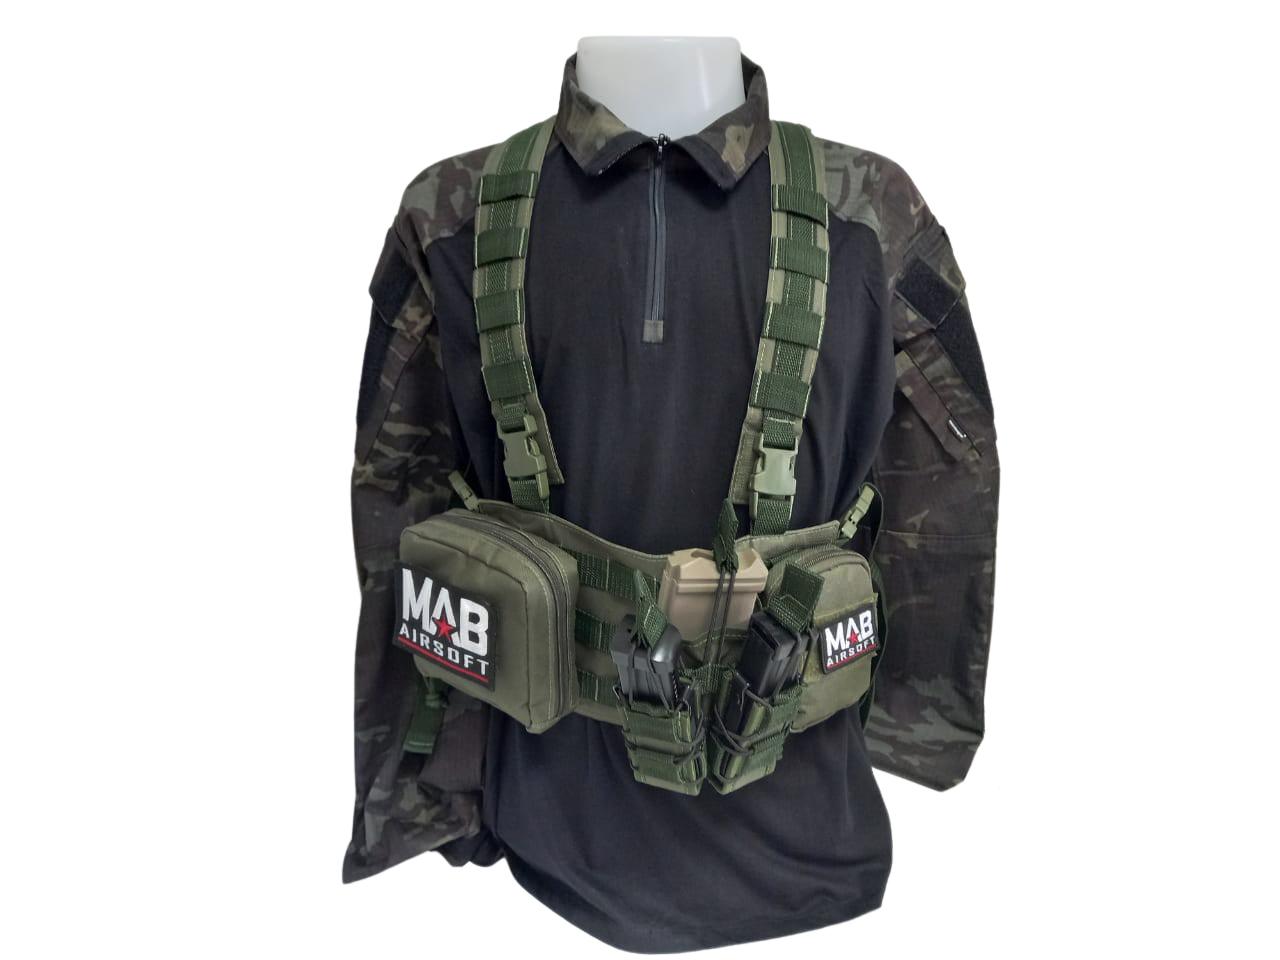 Chest Rig MAB Airsoft  - MAB AIRSOFT